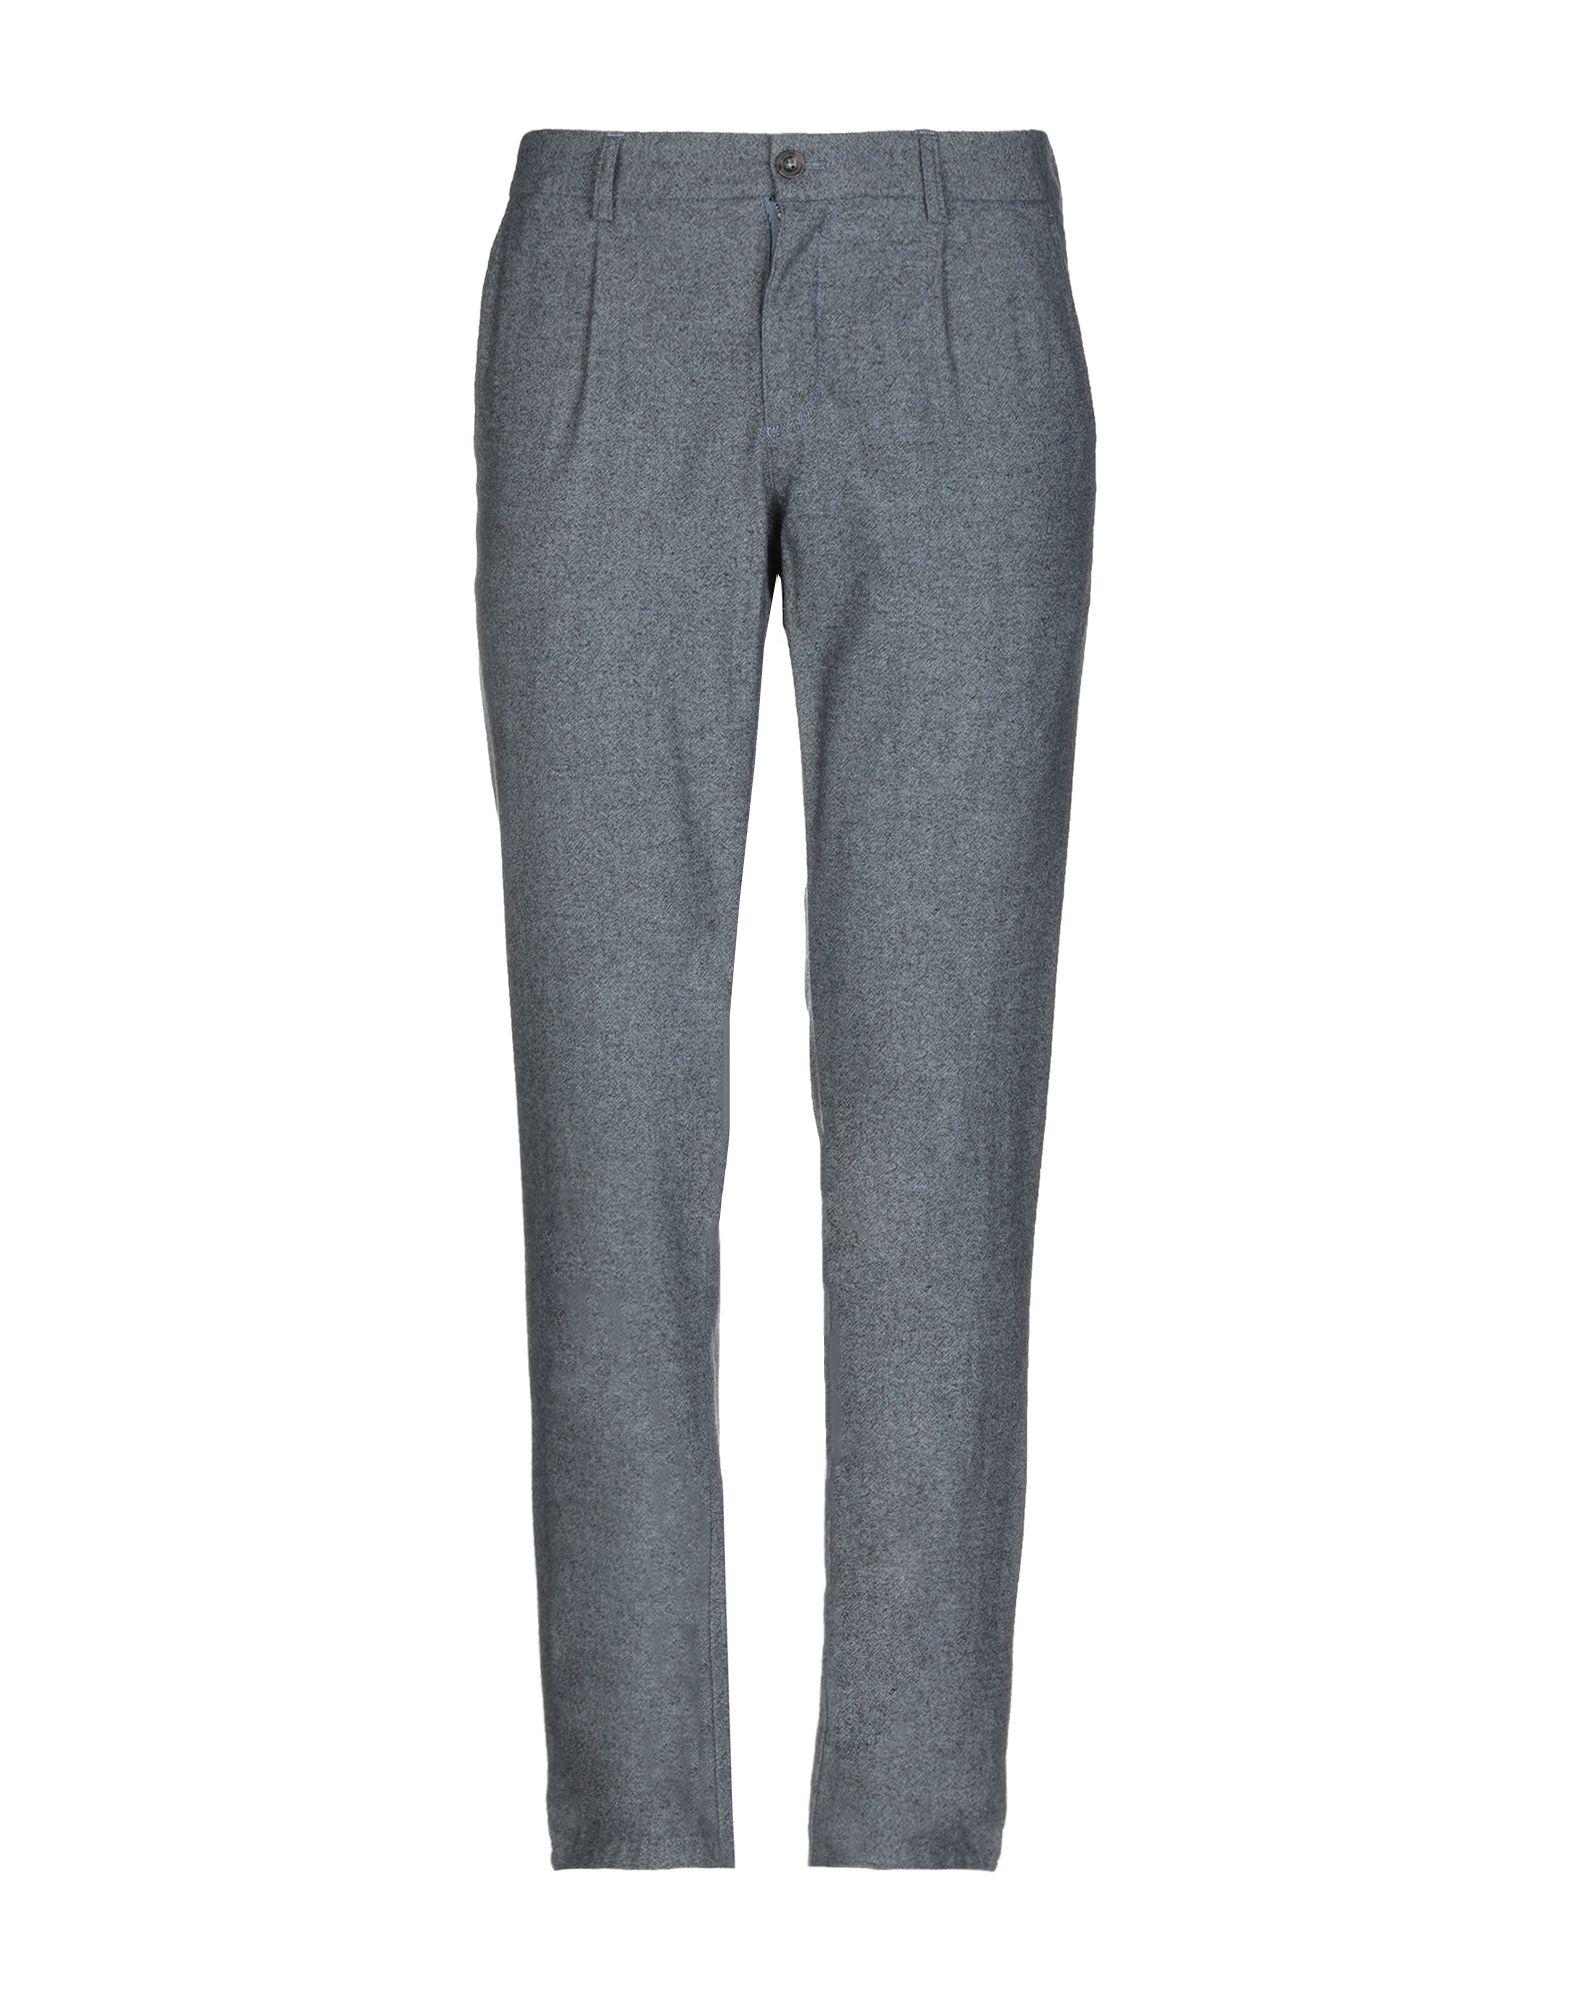 DOMENICO TAGLIENTE Повседневные брюки 19 70 genuine wear повседневные брюки